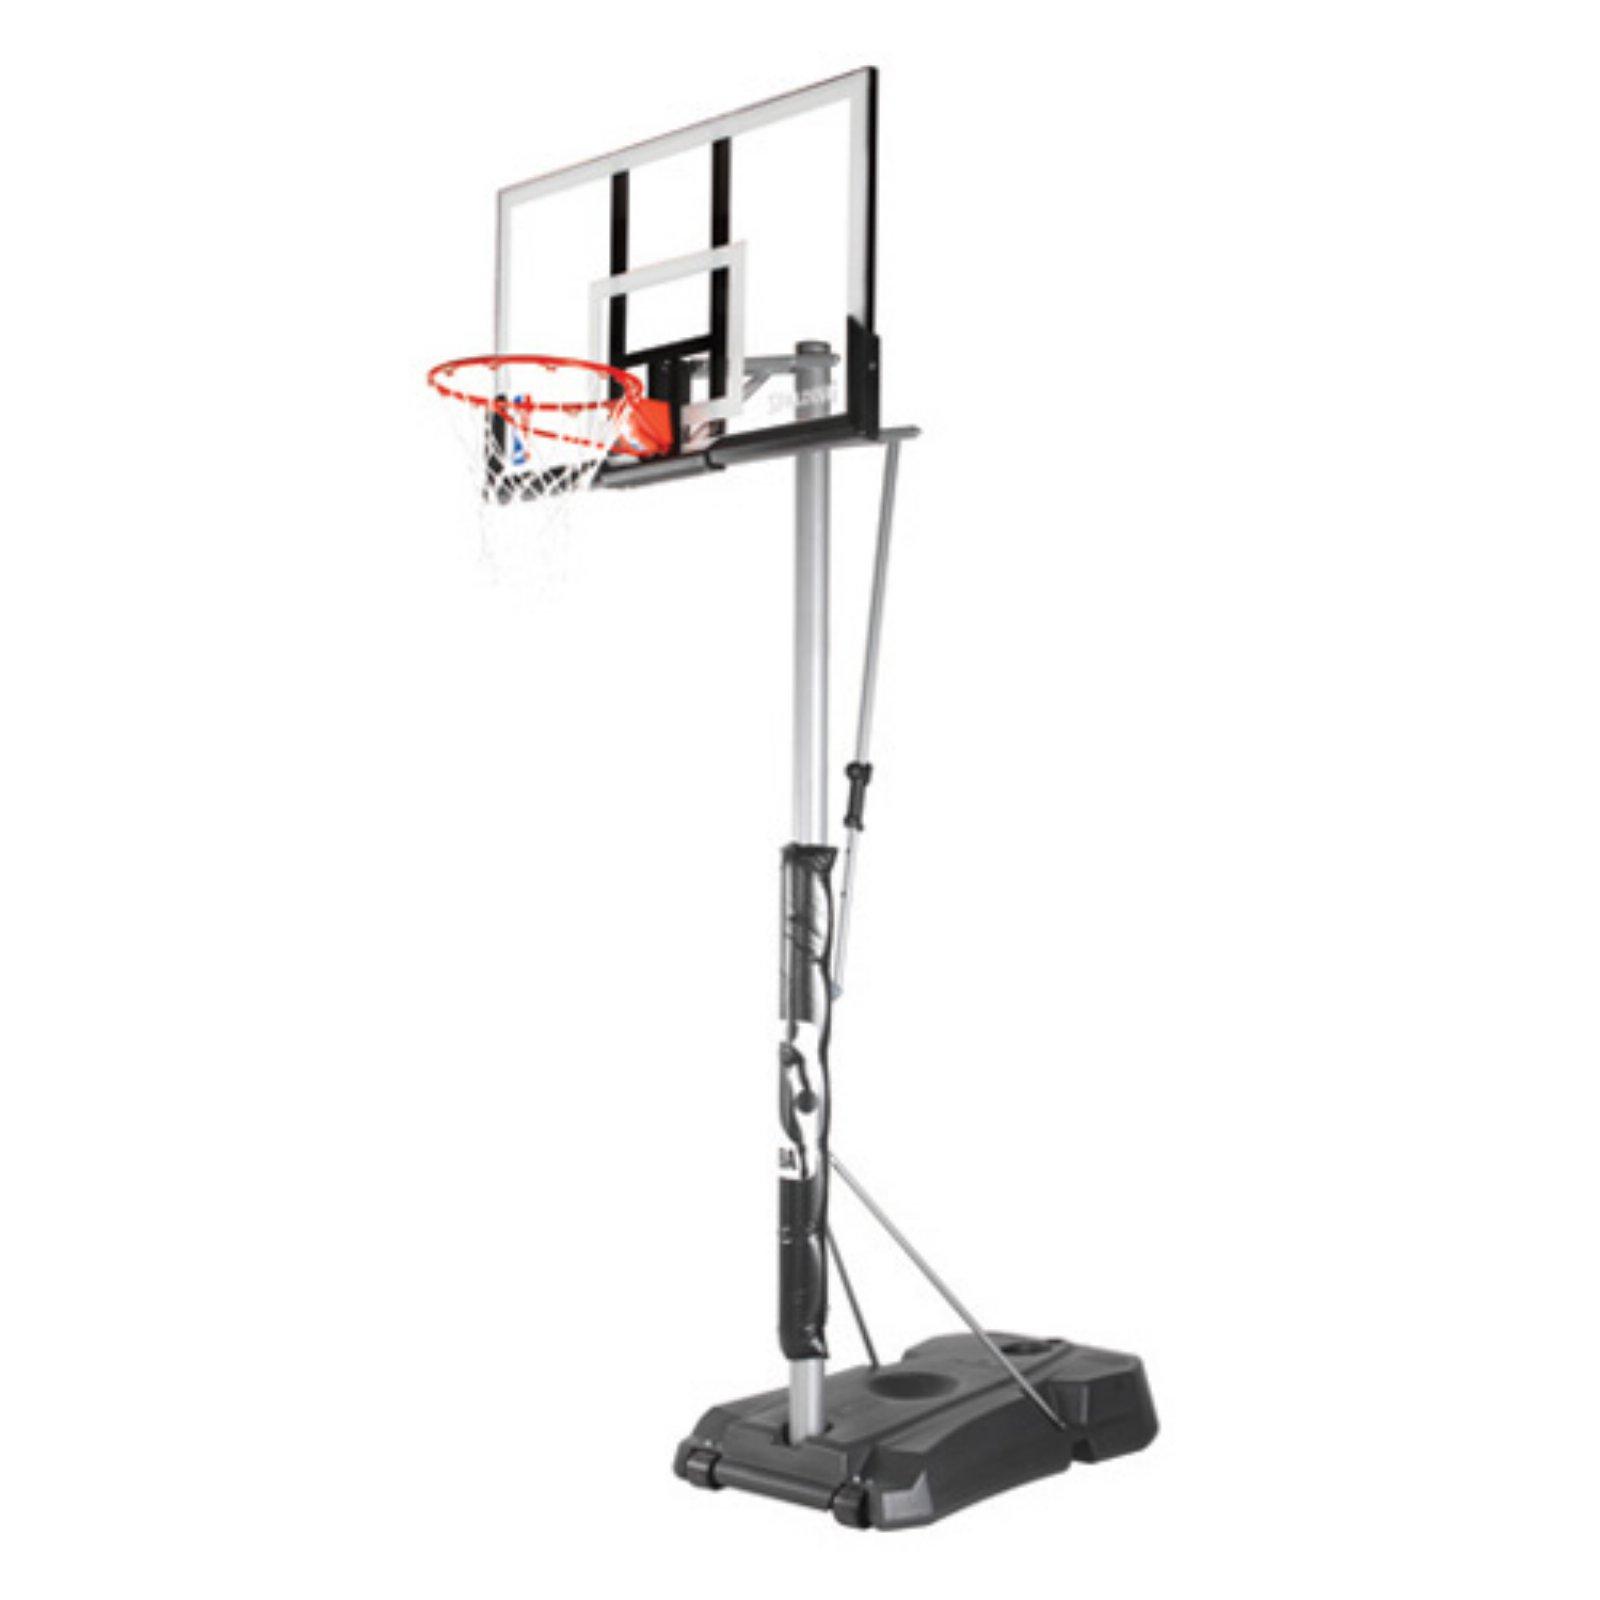 "Spalding NBA 52"" Acrylic Hercules Pro Glide Advanced Portable Hoop System"